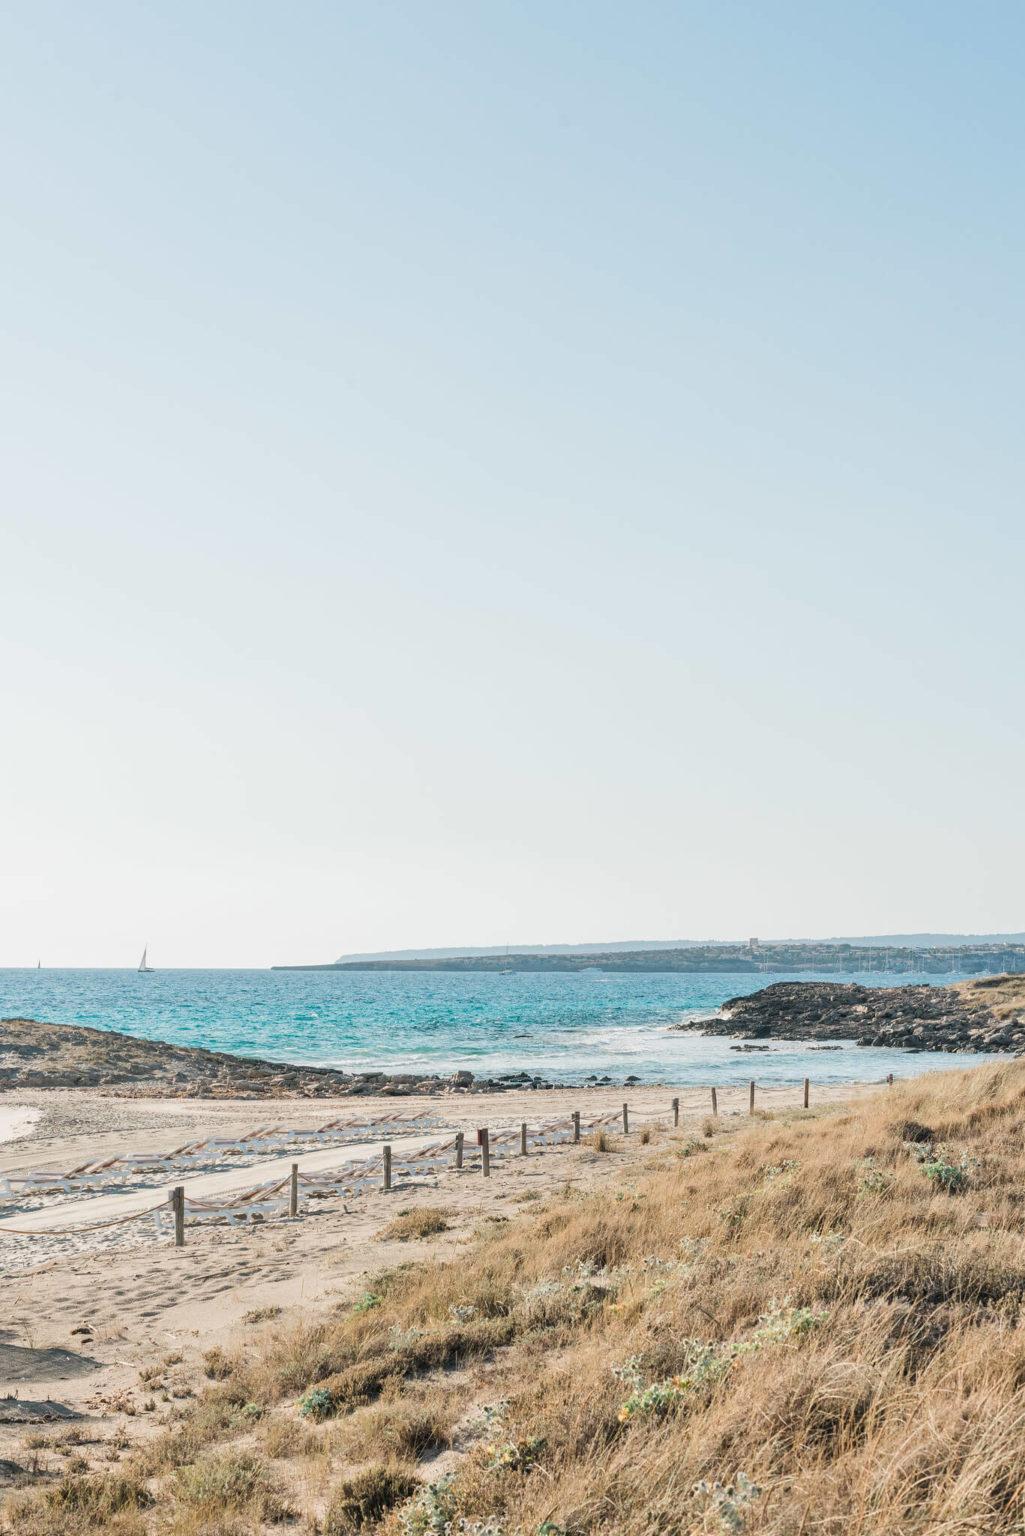 https://www.white-ibiza.com/wp-content/uploads/2020/03/formentera-beaches-es-caval-den-borras-2020-02-1025x1536.jpg